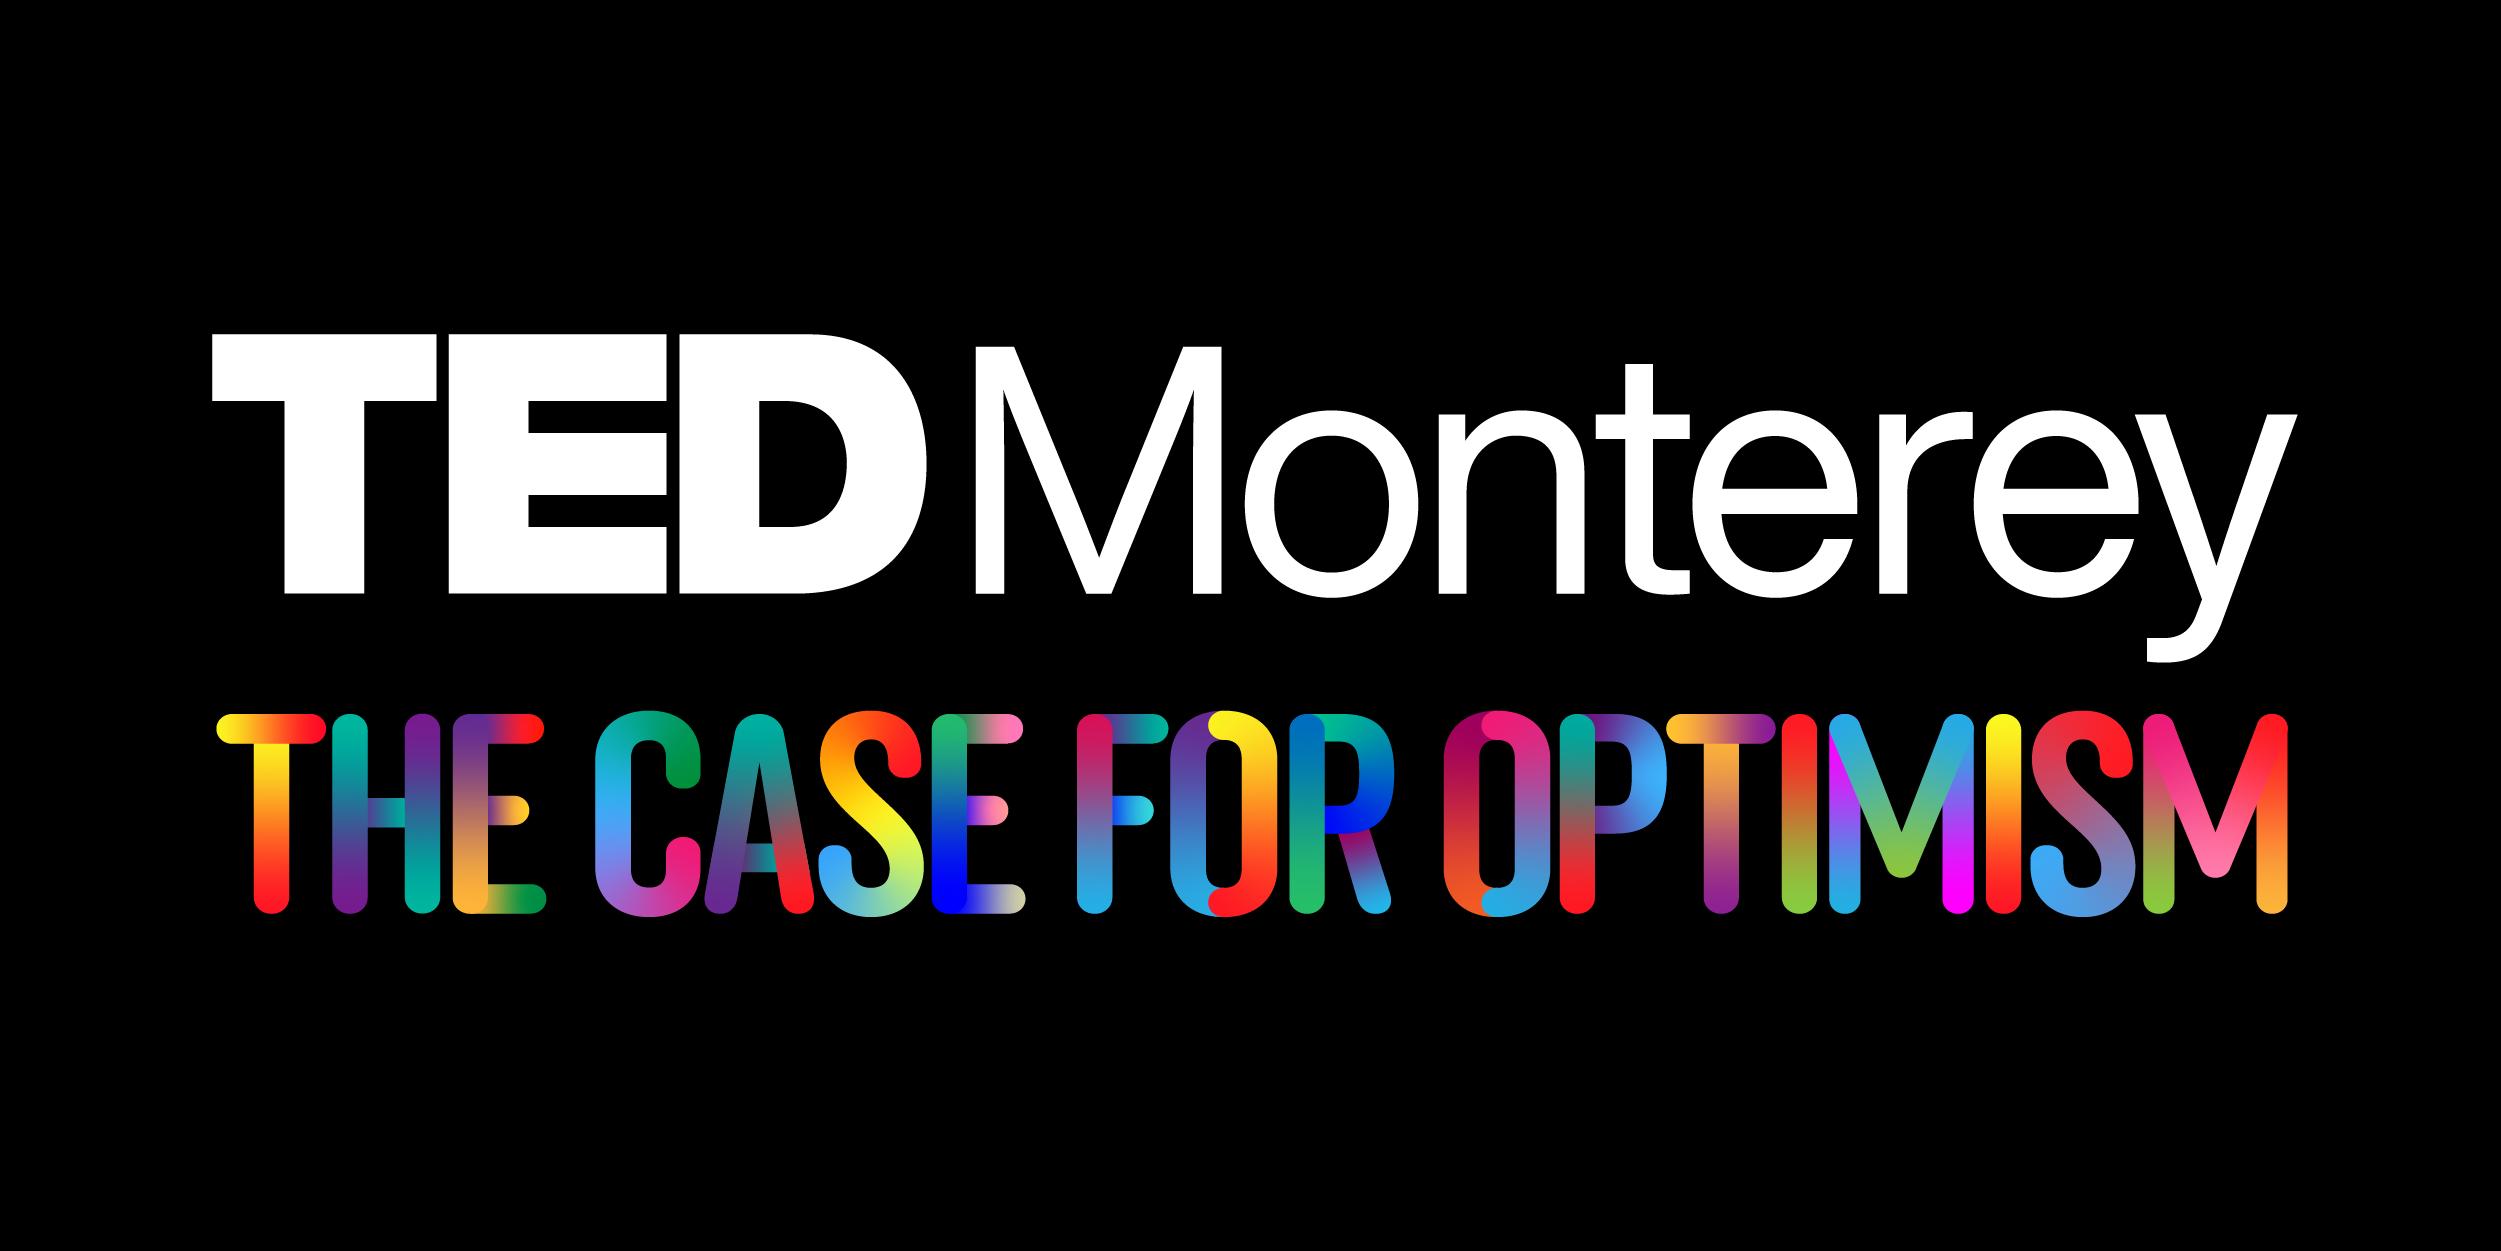 Speakers revealed for TEDMonterey 2021: The Case for Optimism